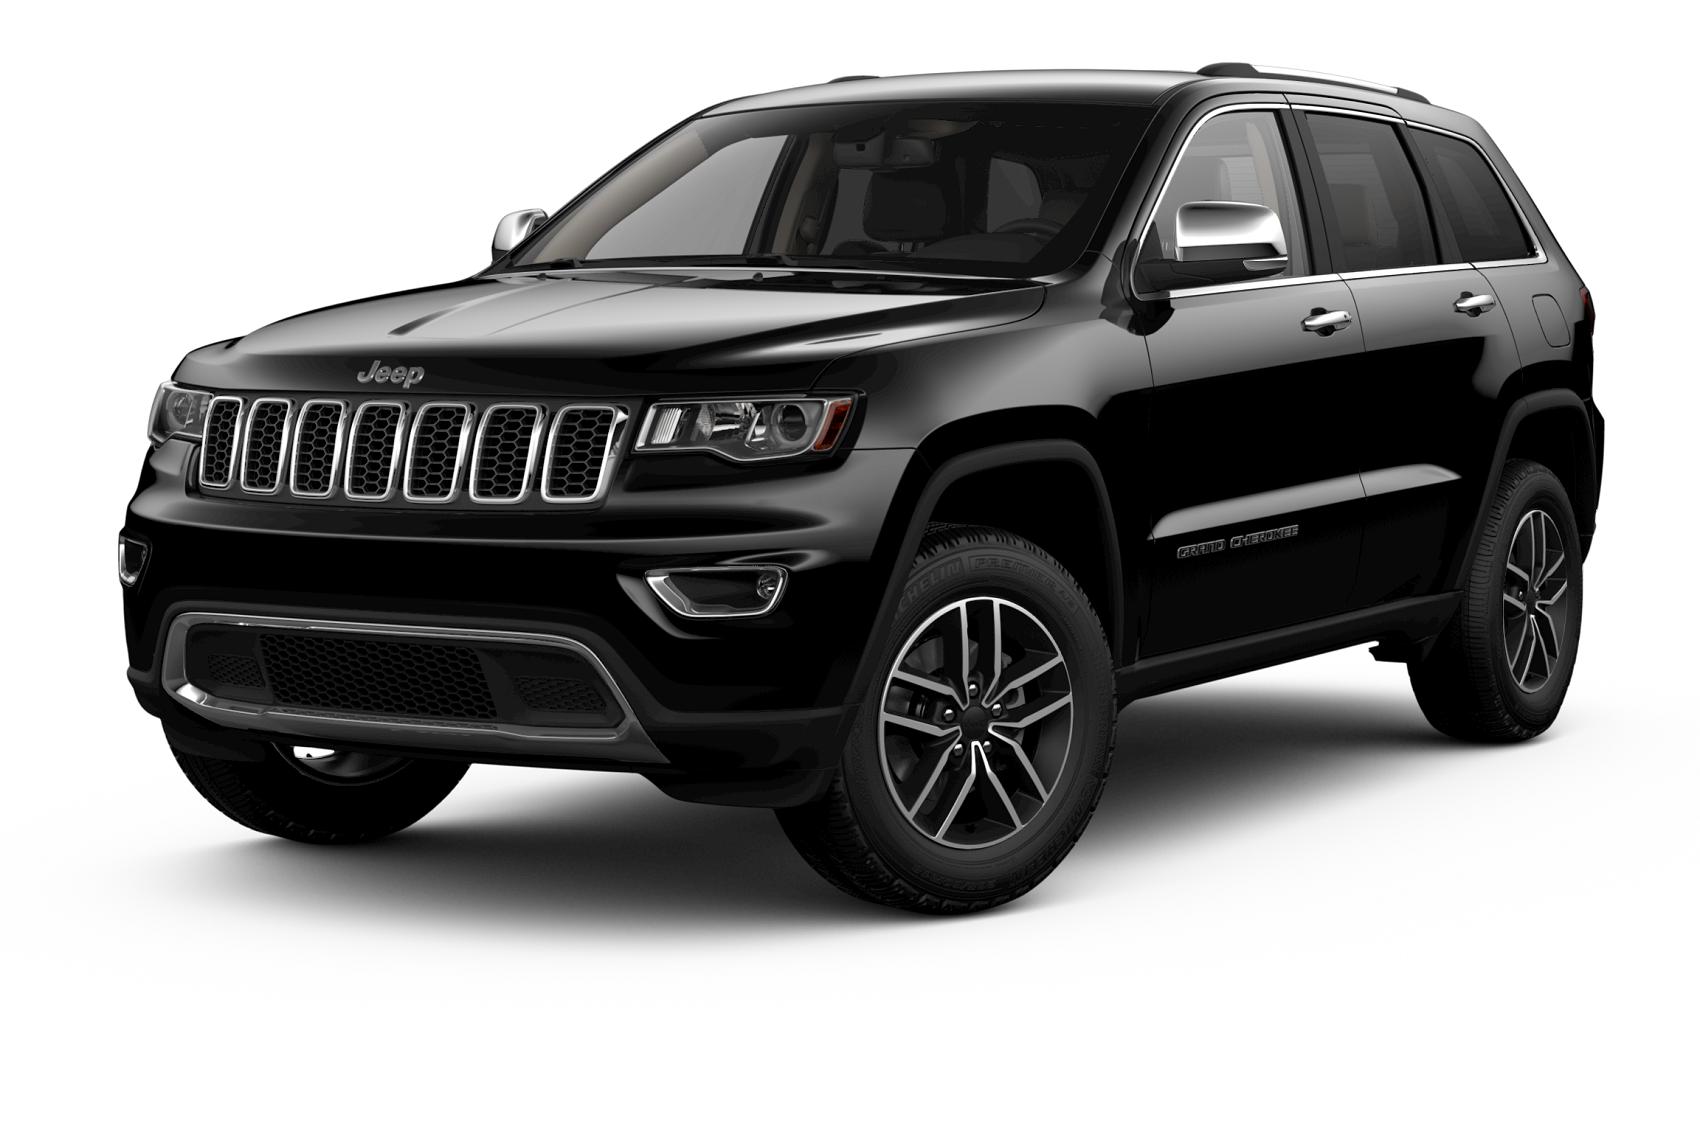 2020 Jeep Grand Cherokee Medford MA